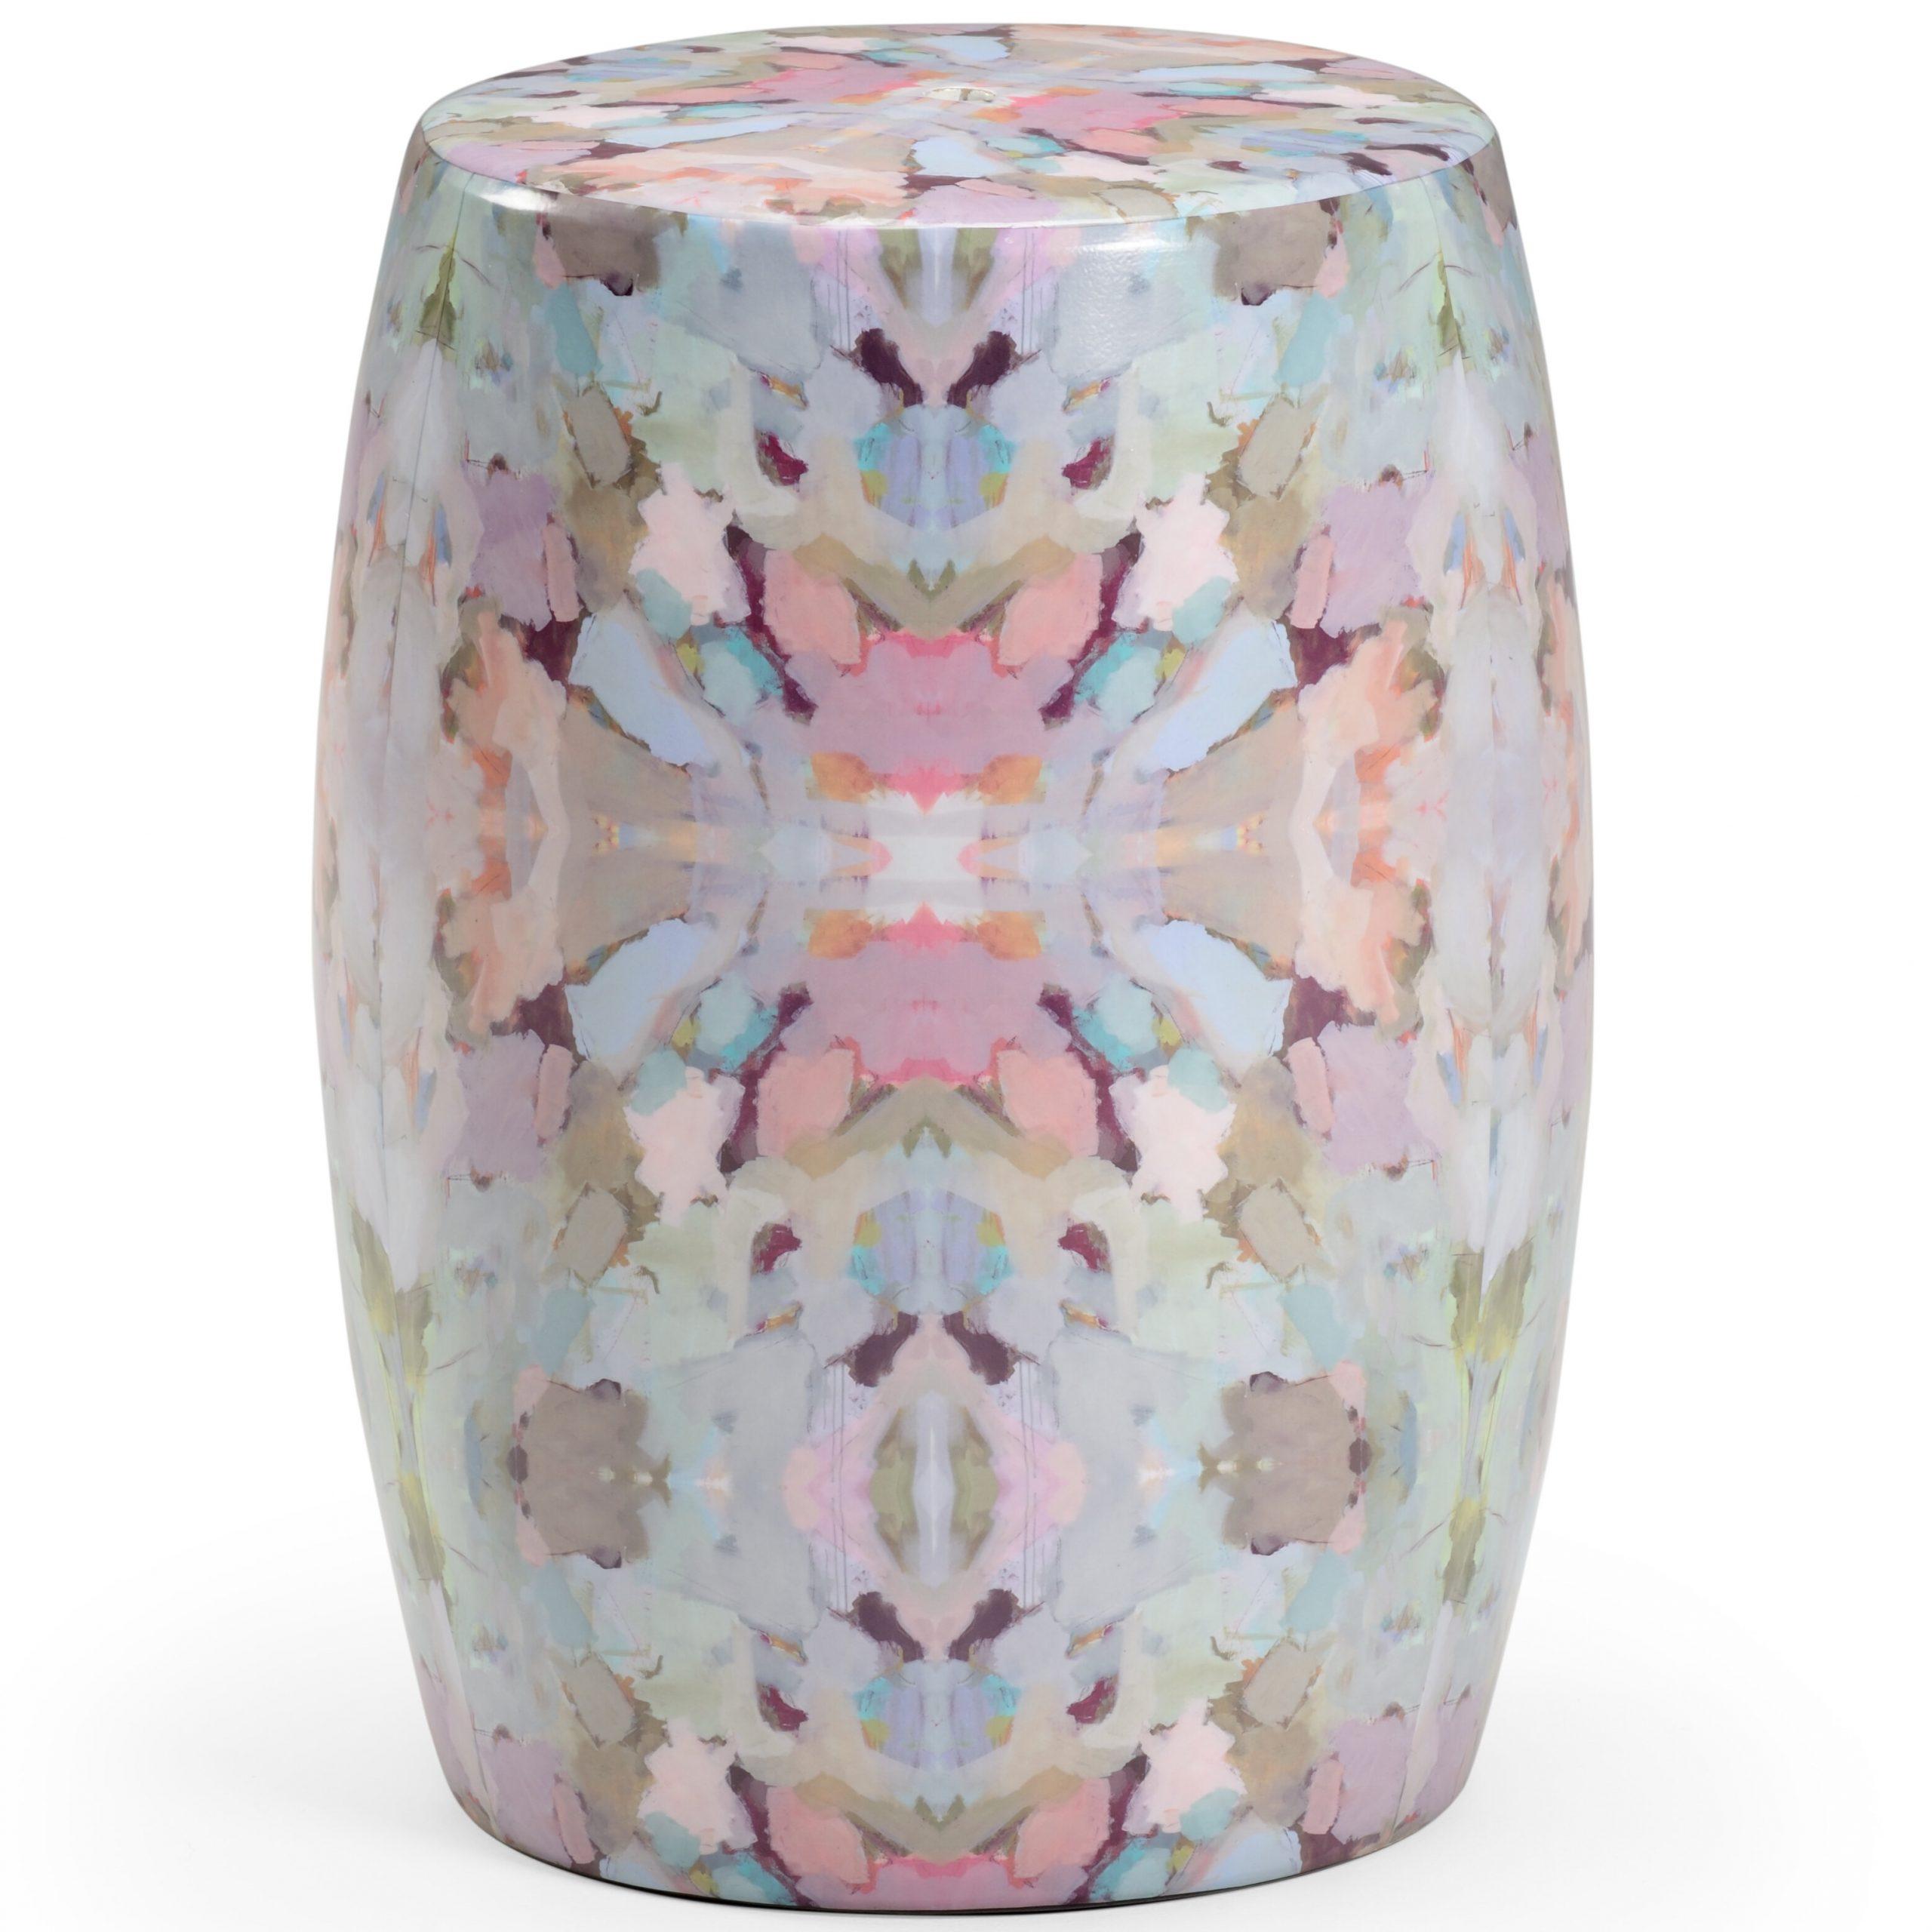 Arden Ceramic Garden Stool Intended For Williar Cherry Blossom Ceramic Garden Stools (View 3 of 25)